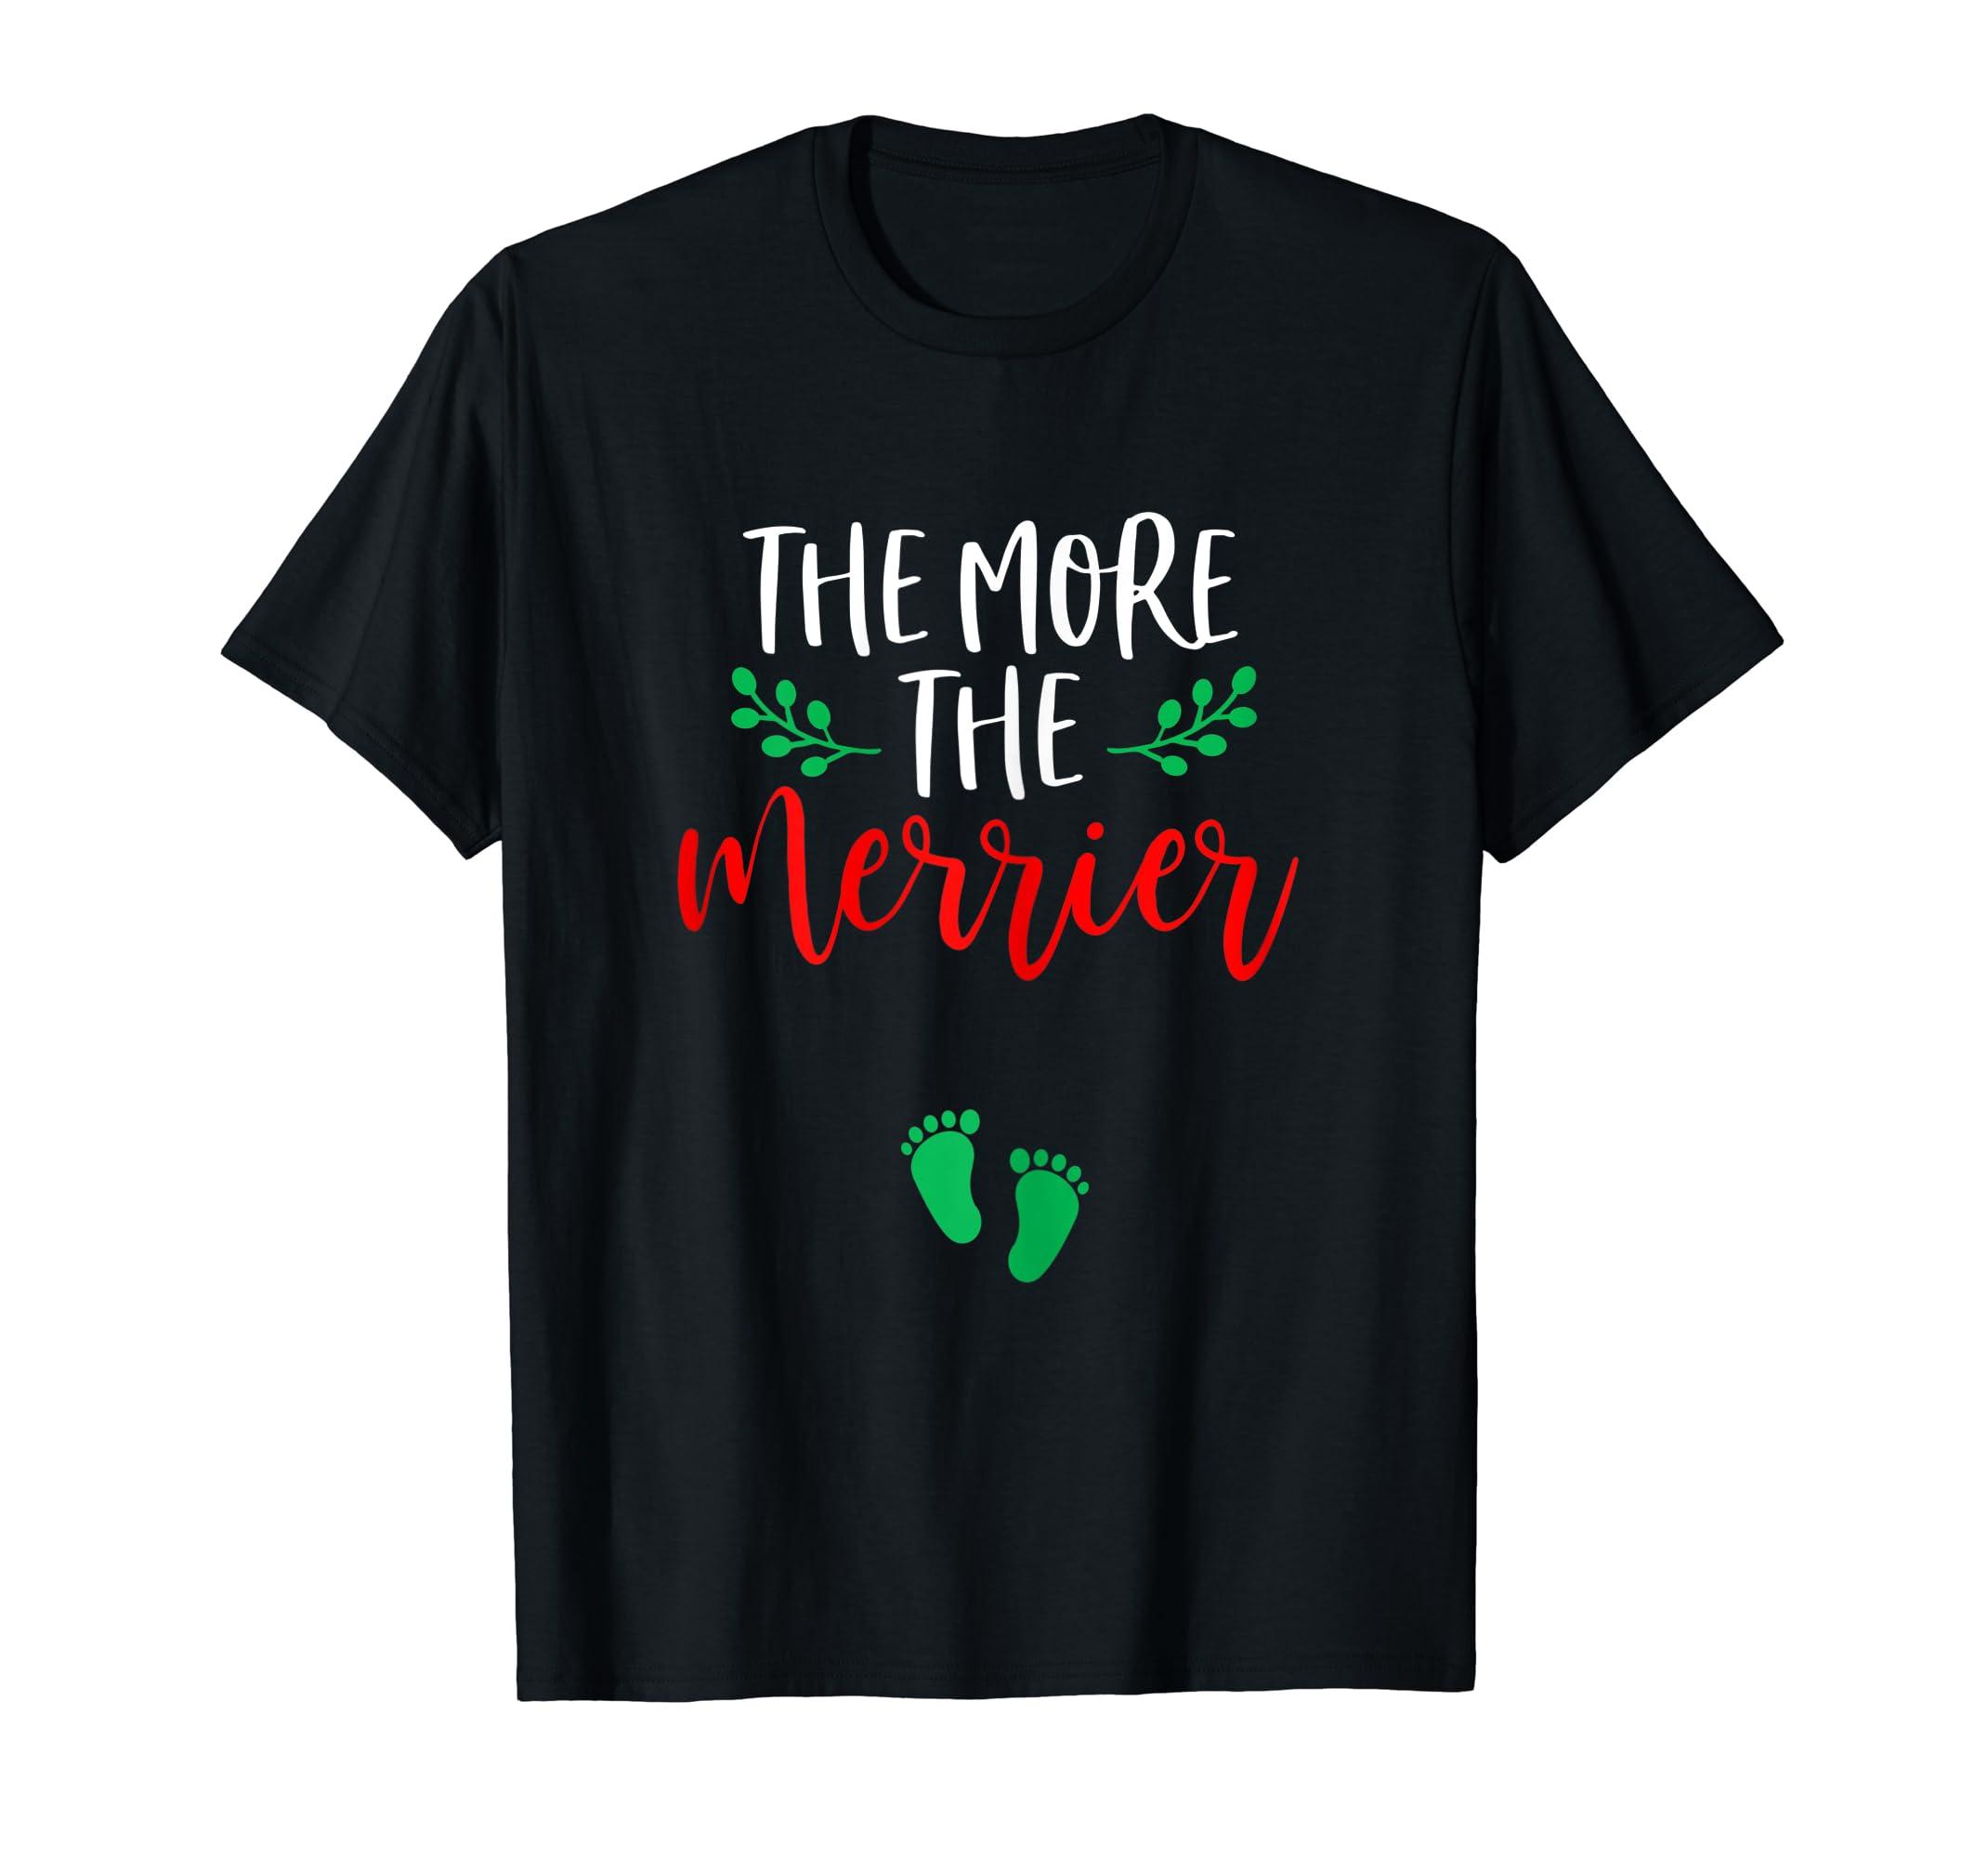 Womens Christmas Pregnancy Announcement Shirt Holiday Baby Reveal T-Shirt-Men's T-Shirt-Black